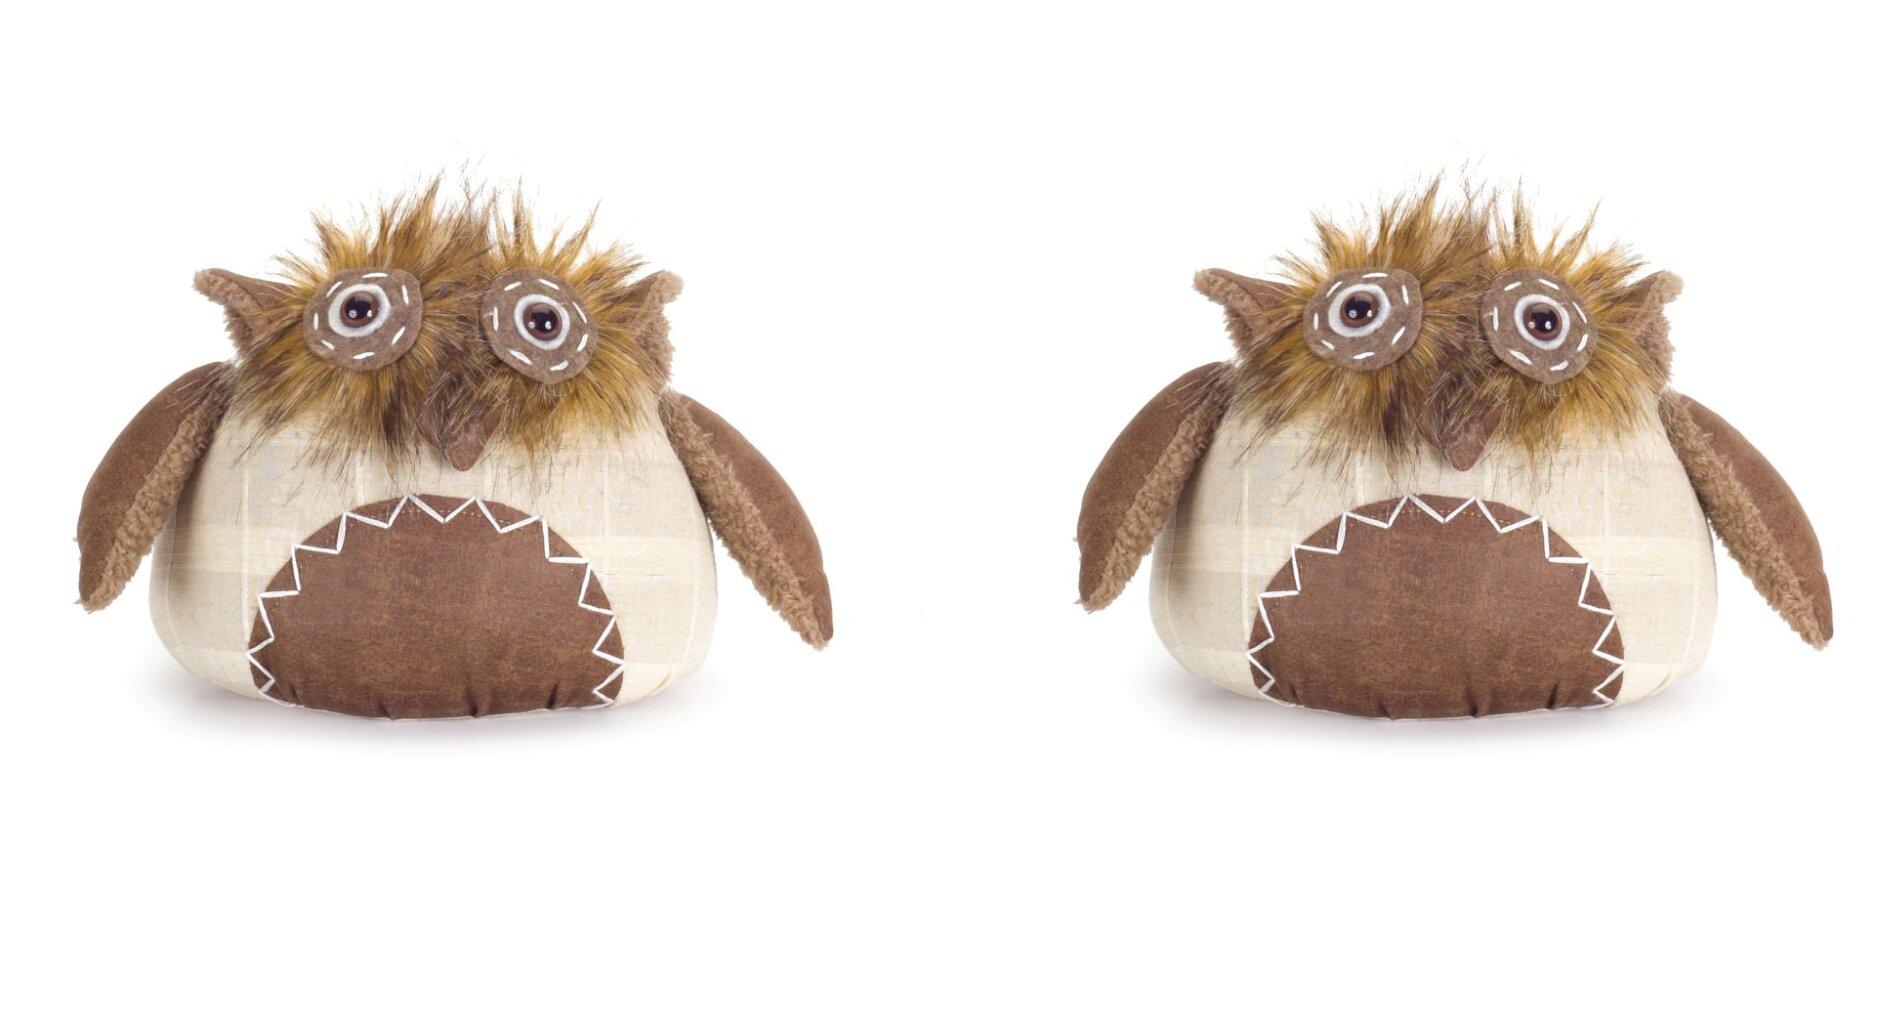 Melrose Intl Owl Fabric Weighted Floor Stop Wayfair